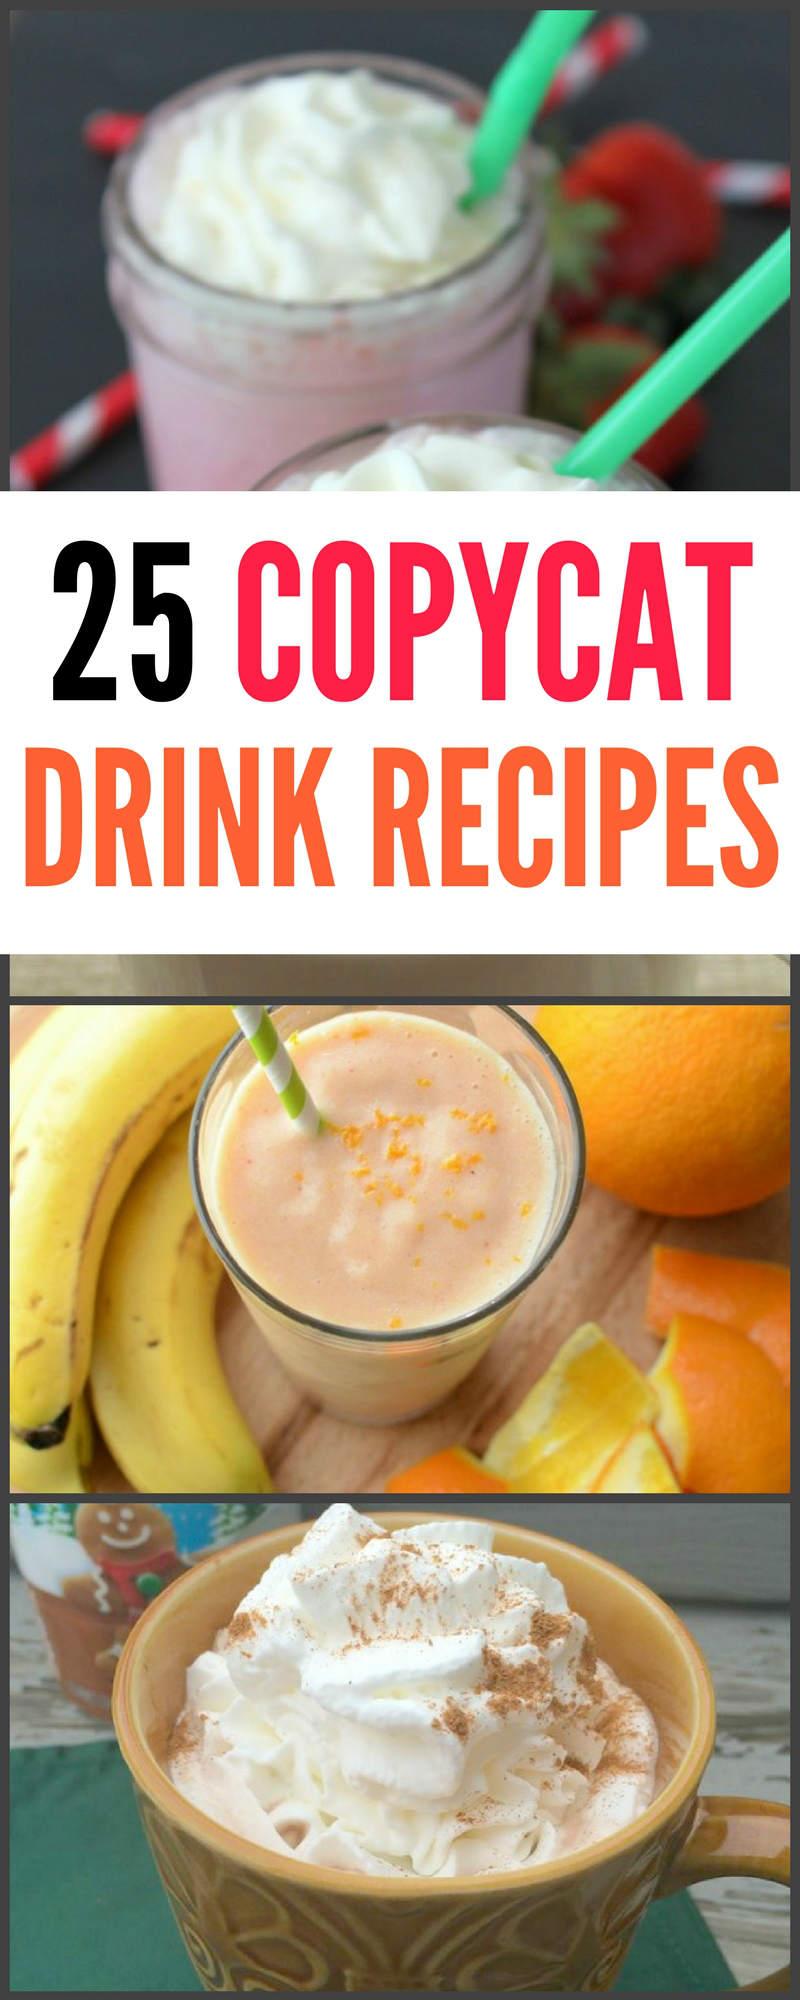 25 Easy Copycat Drink Recipes You will Love #drink #copycat #starbucks #Starbuckscoffee